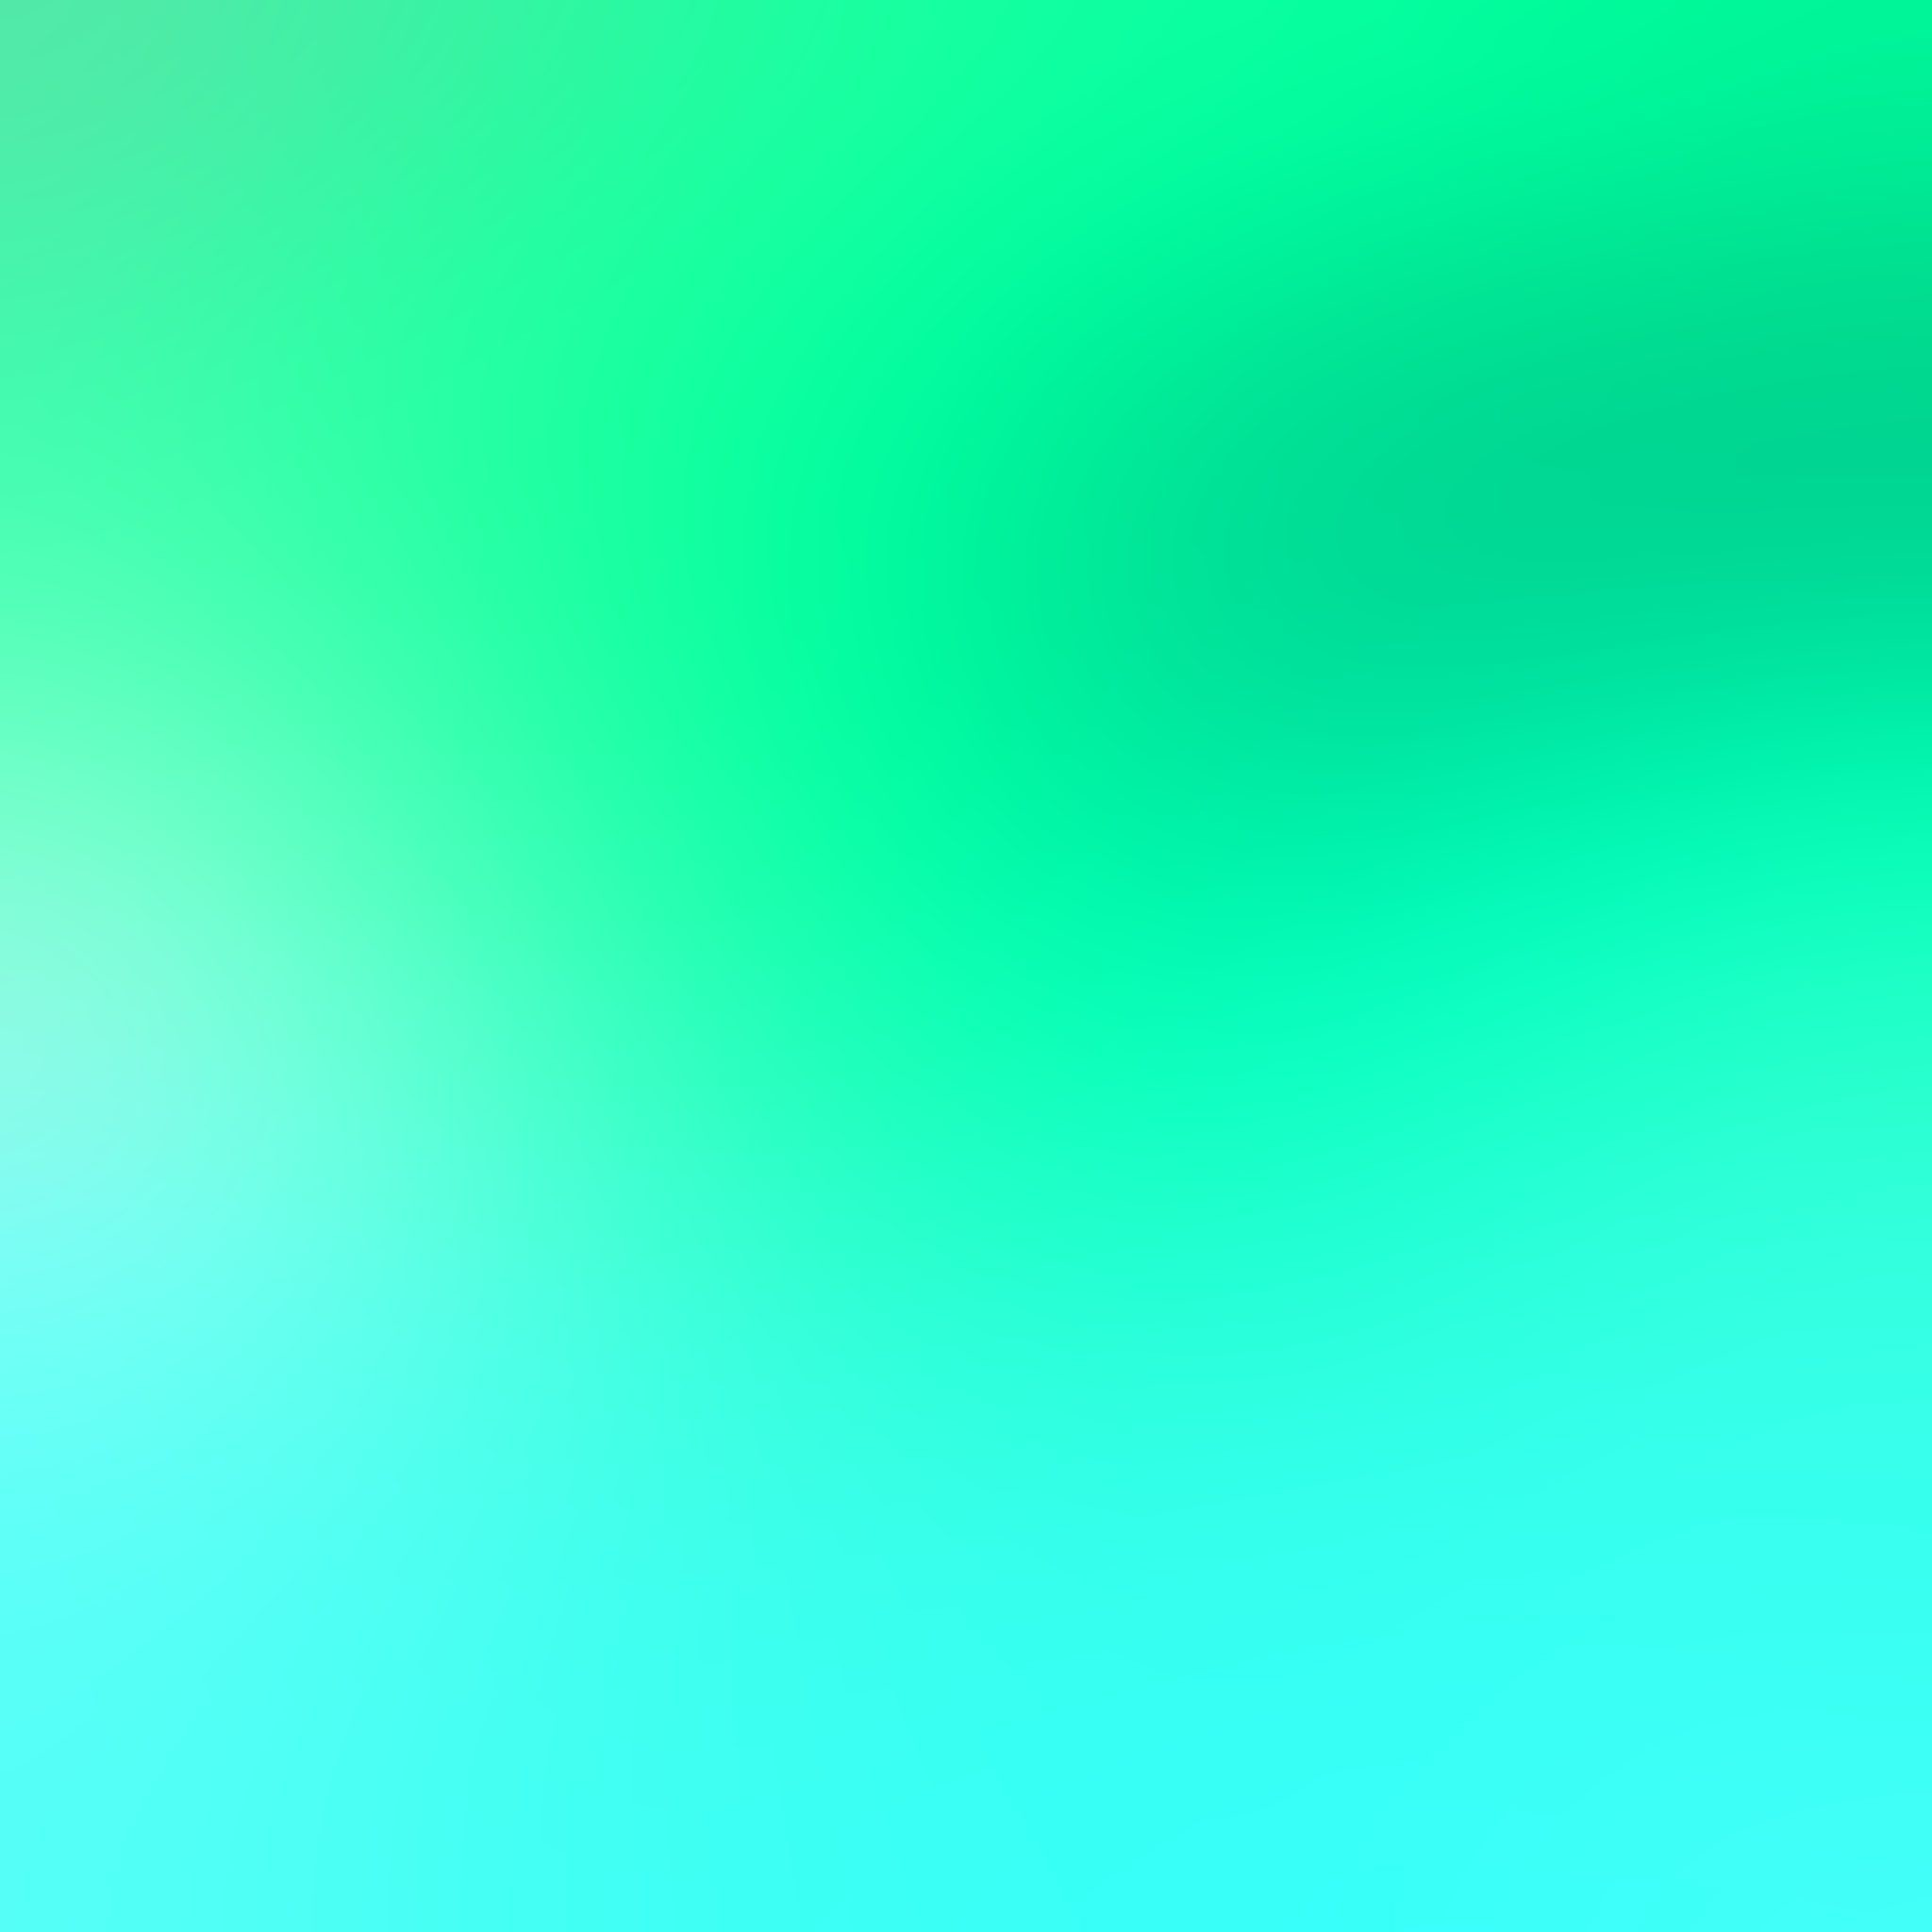 Solid Neon Colors – wallpaper.